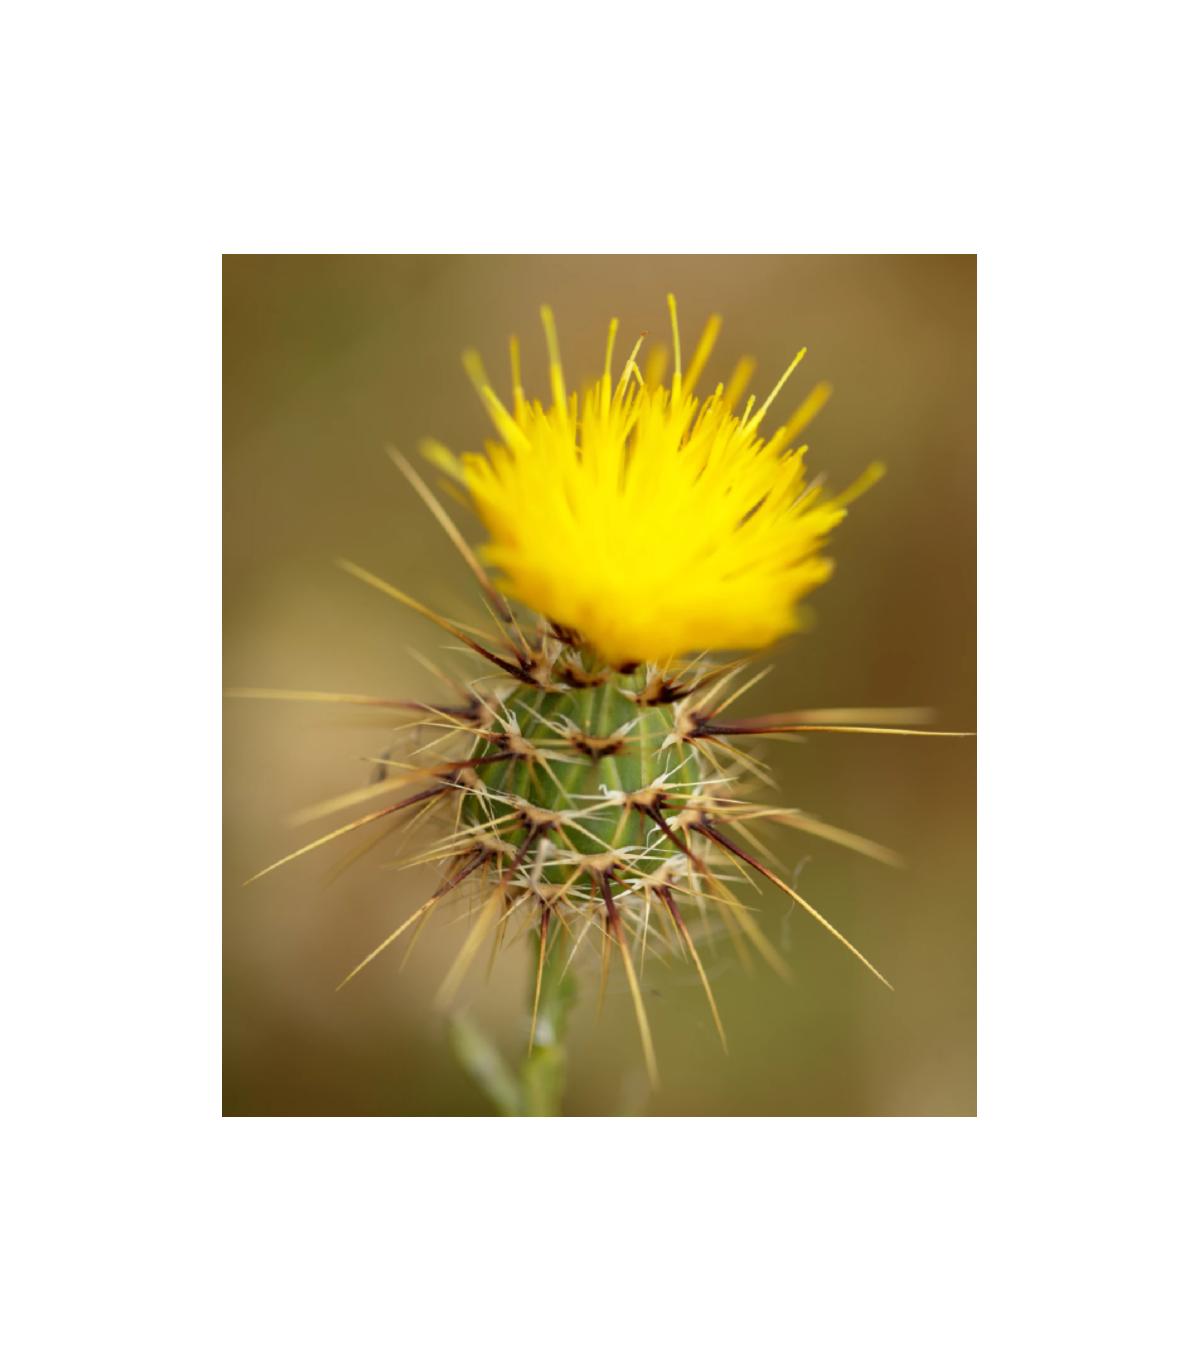 Nevädza lúčna žltá - Centaurea cyanus - semená nevädze - 50 ks